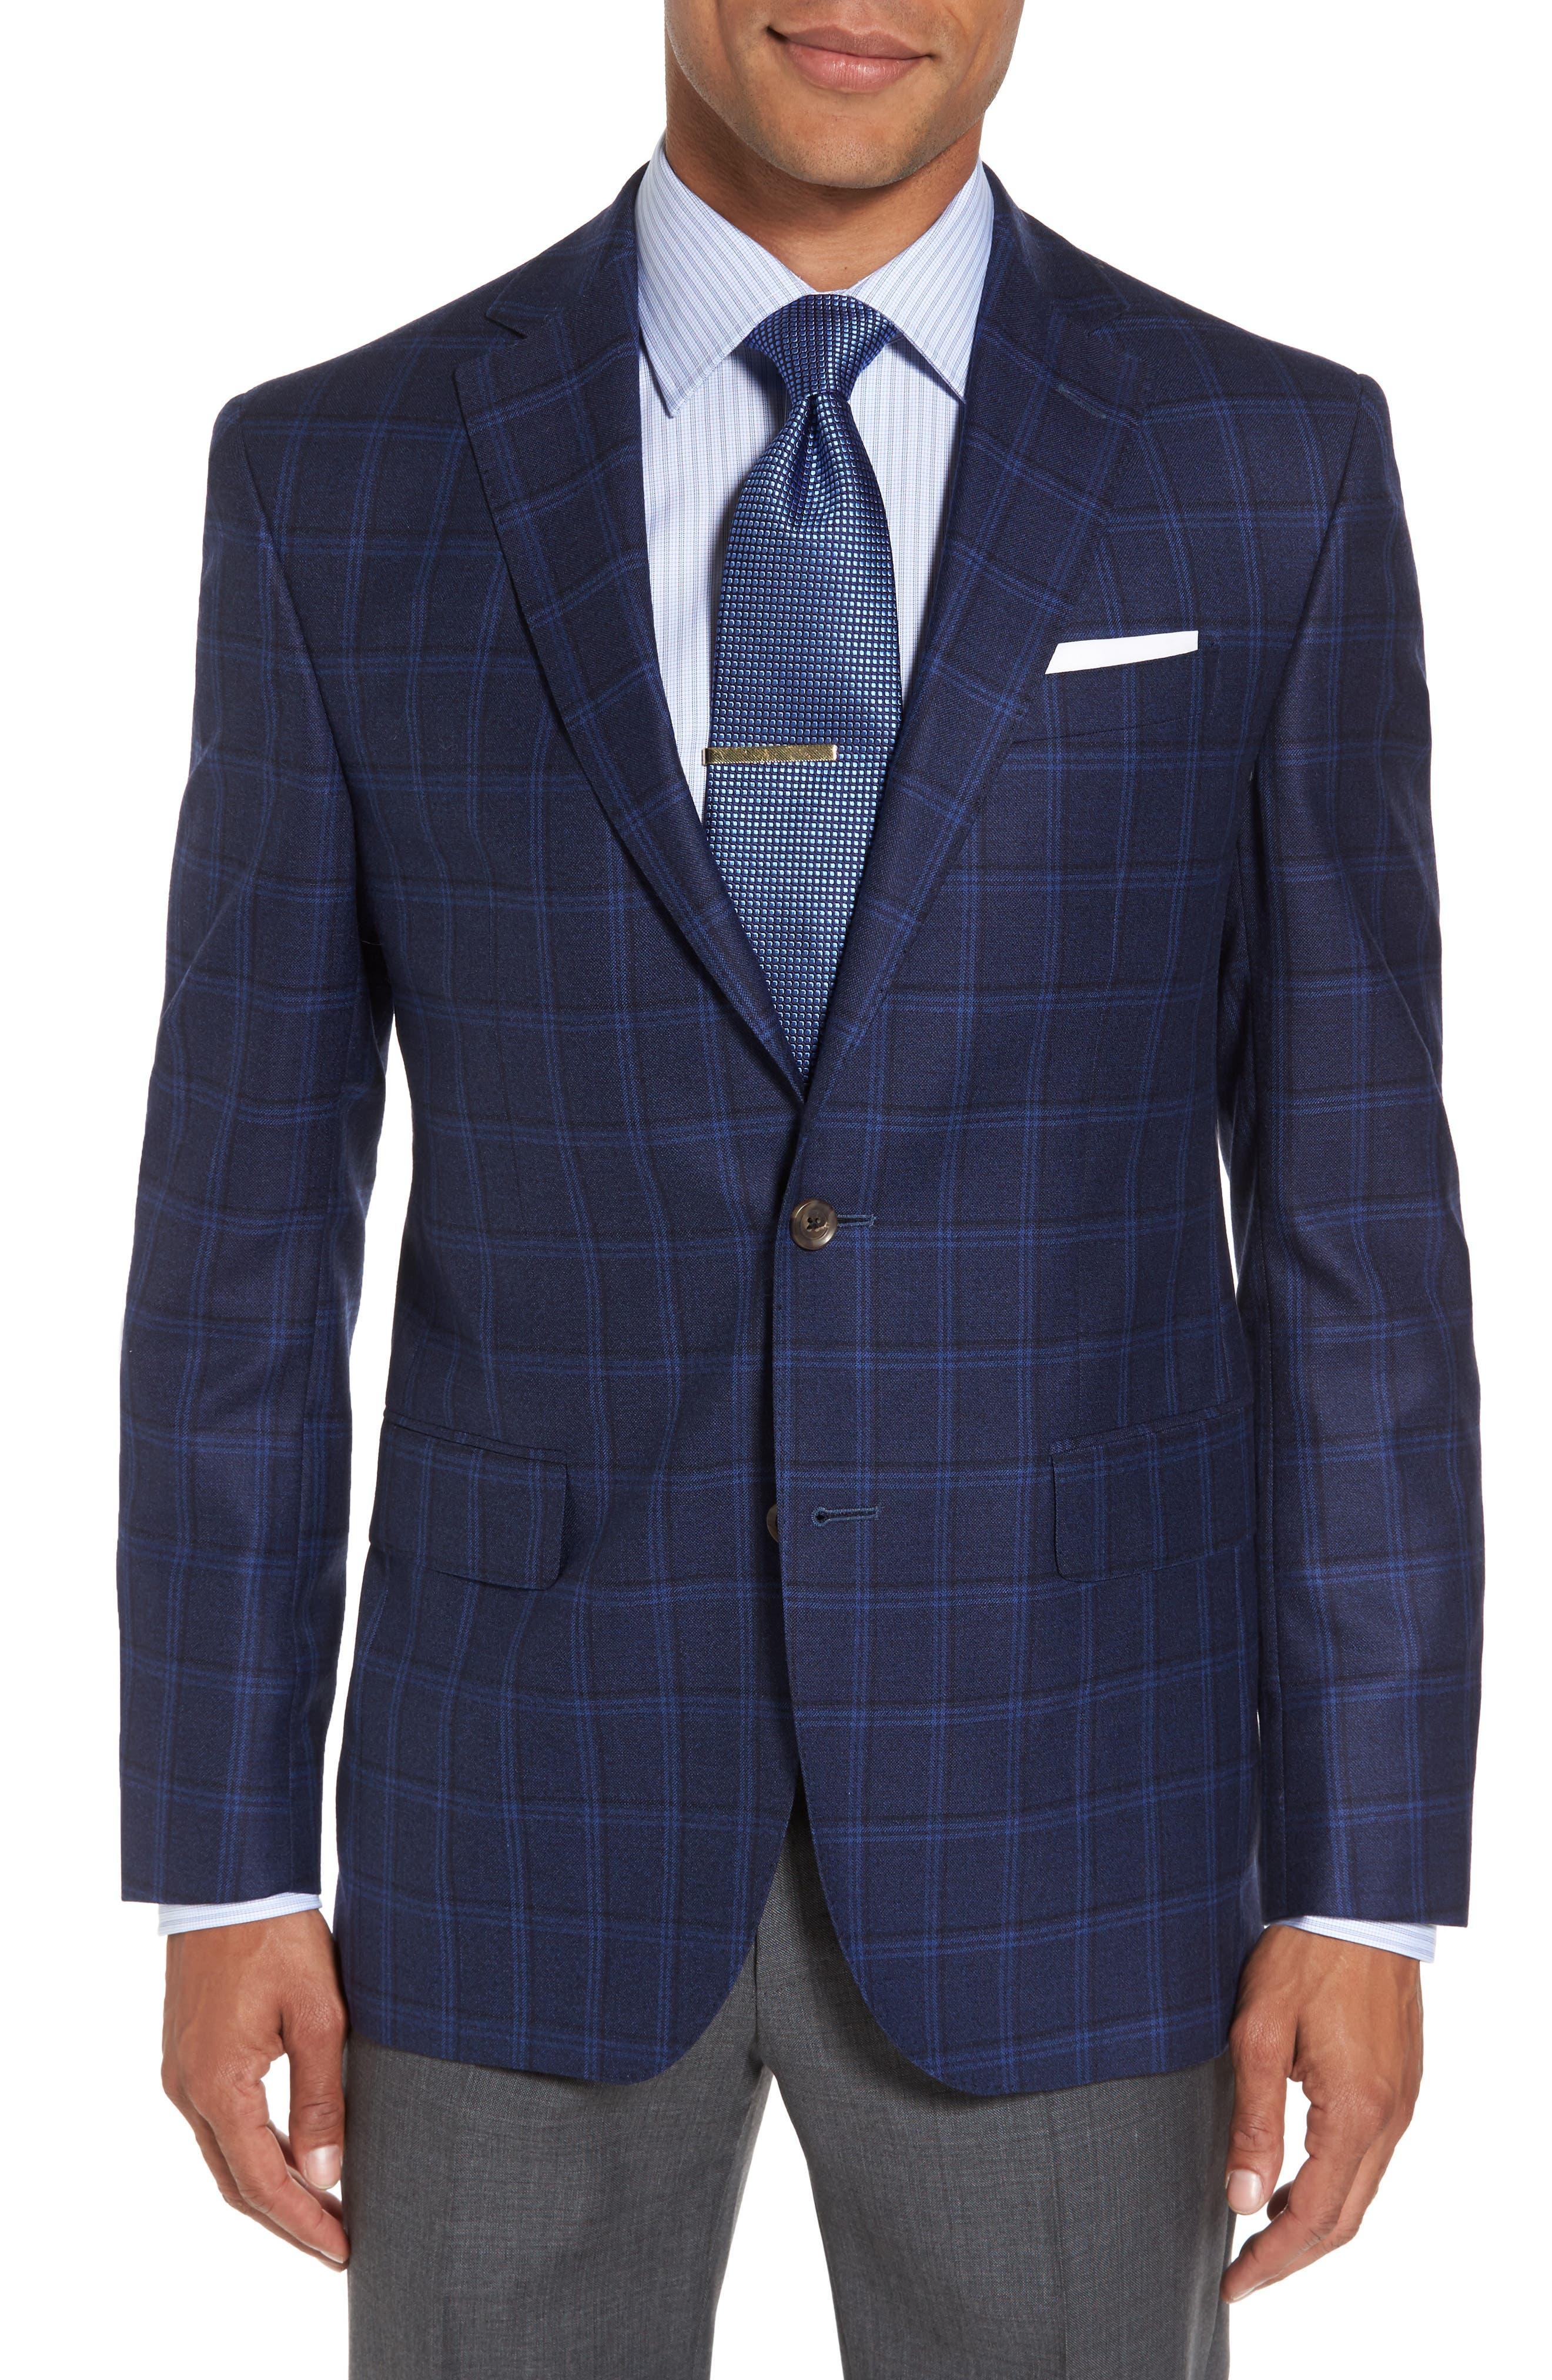 Alternate Image 1 Selected - David Donahue Conner Classic Fit Sport Coat